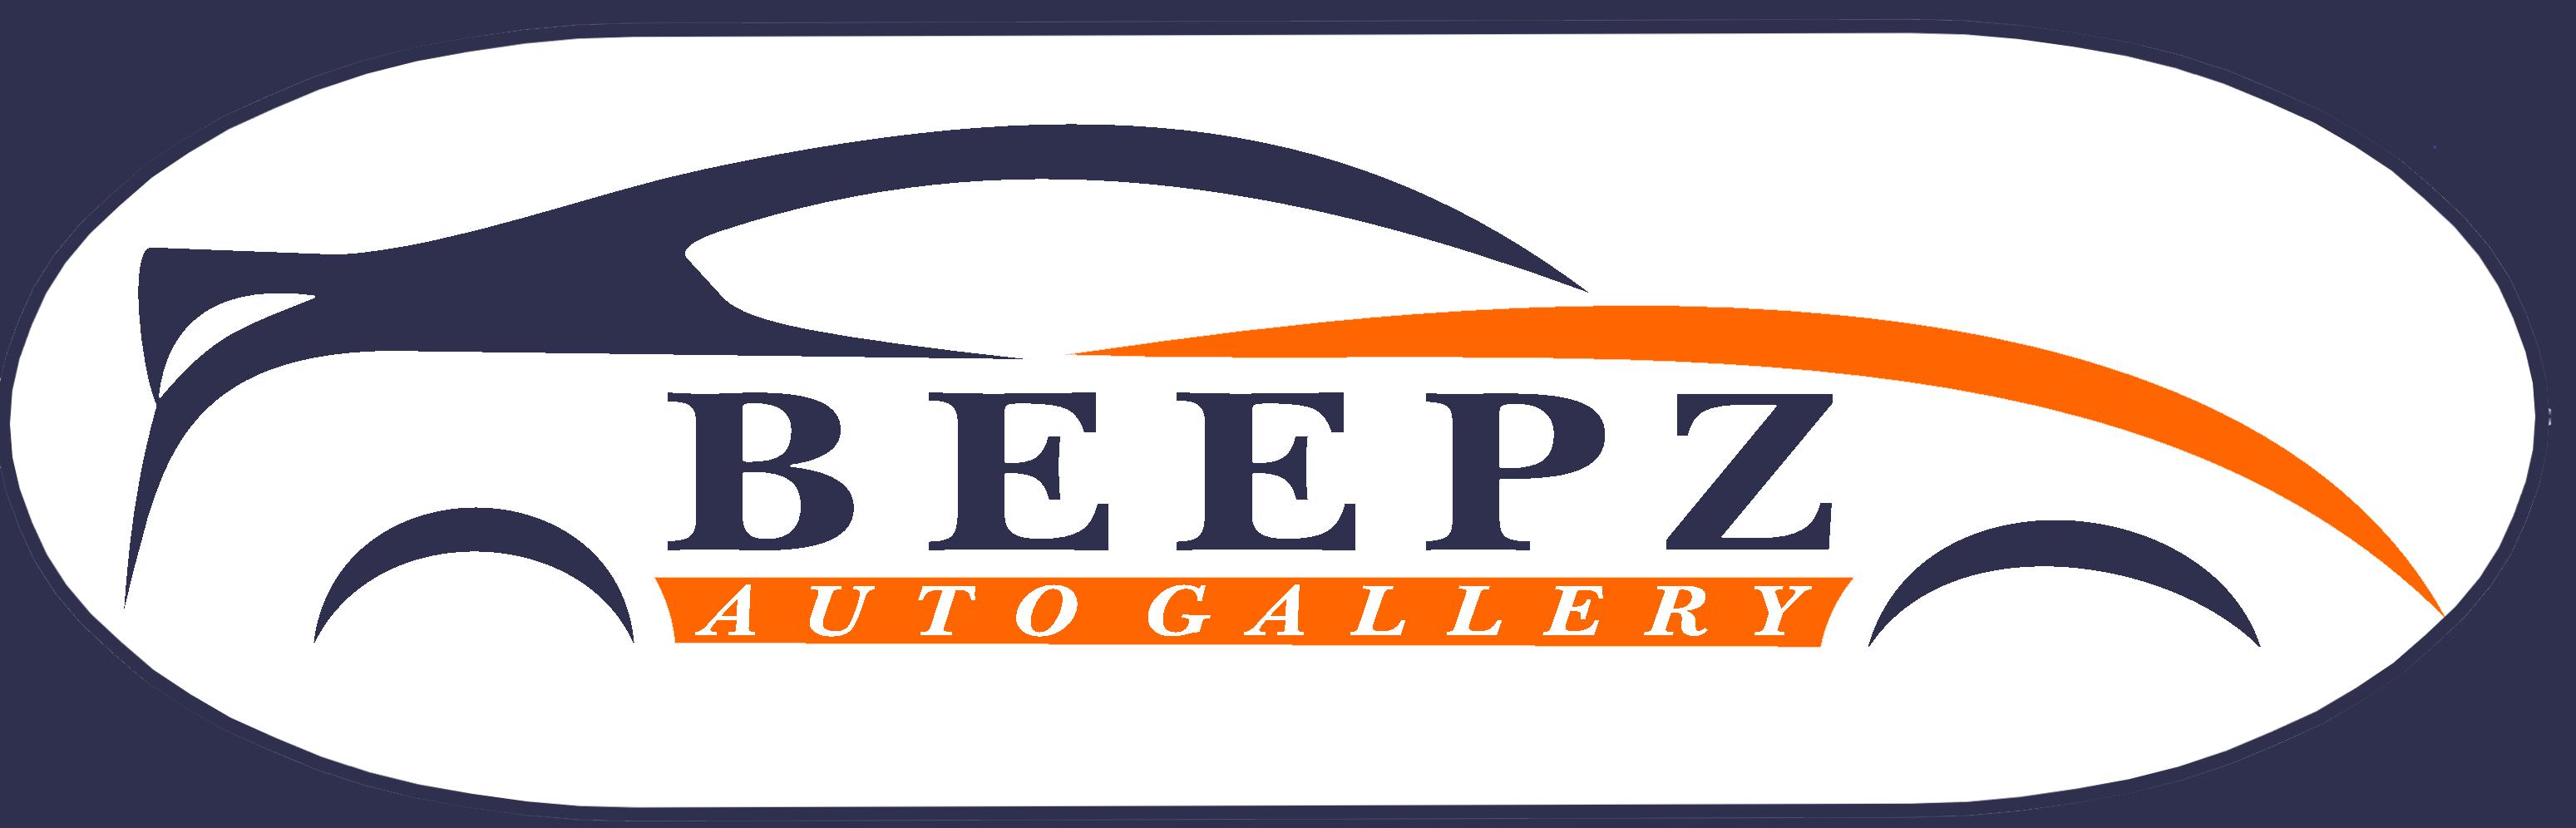 BEEPZ Auto Gallery LLC